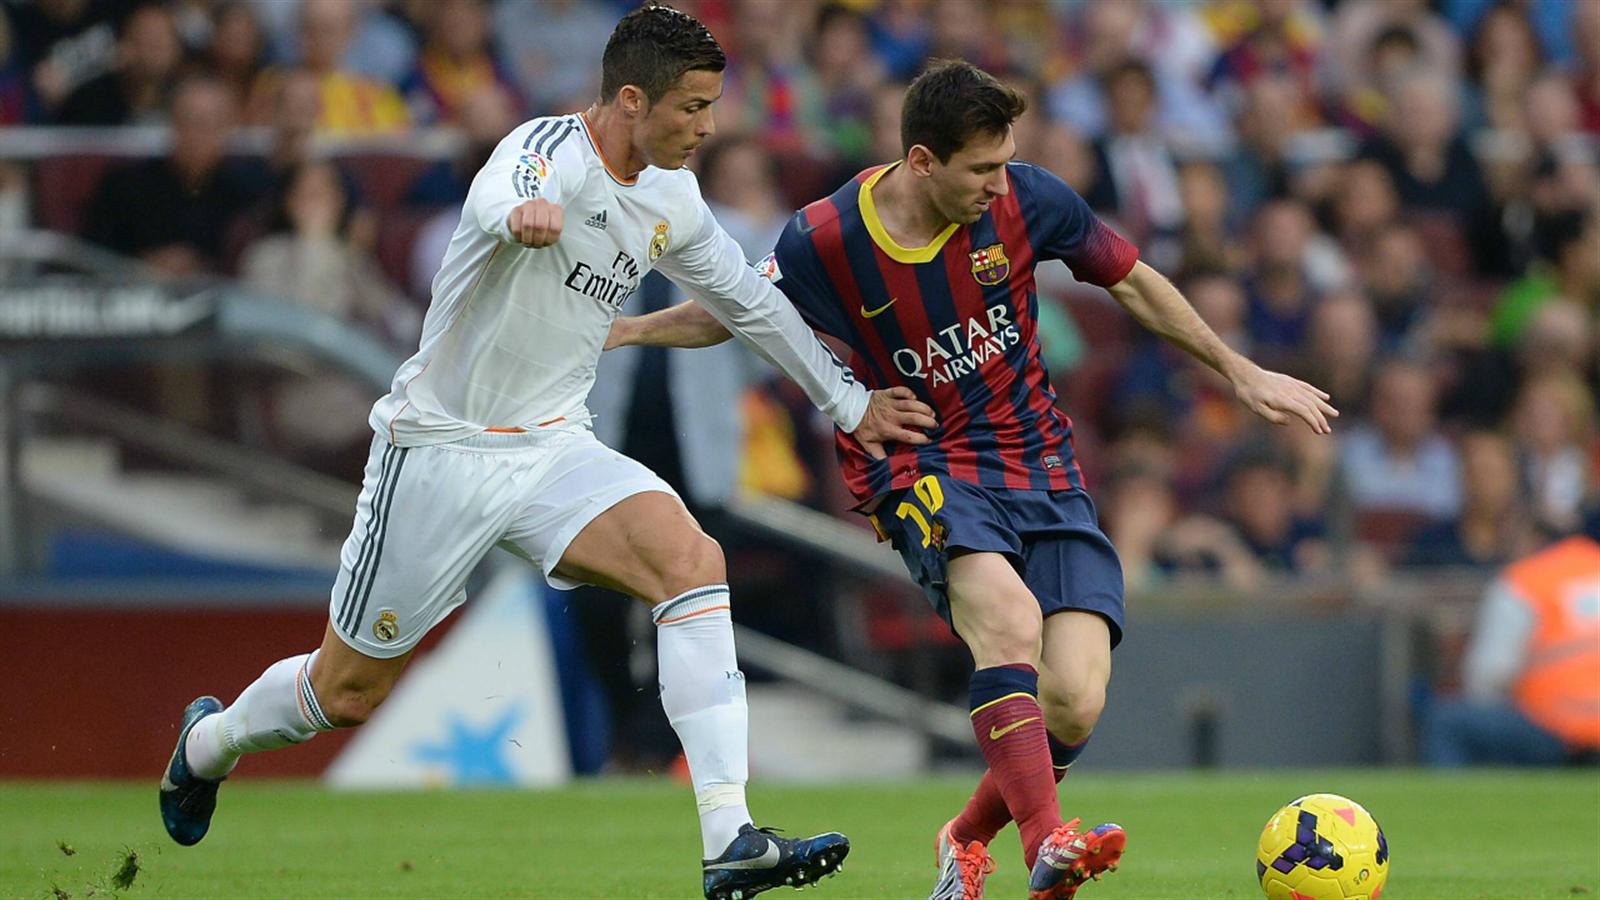 Real Madrid Vs Psg Match Video